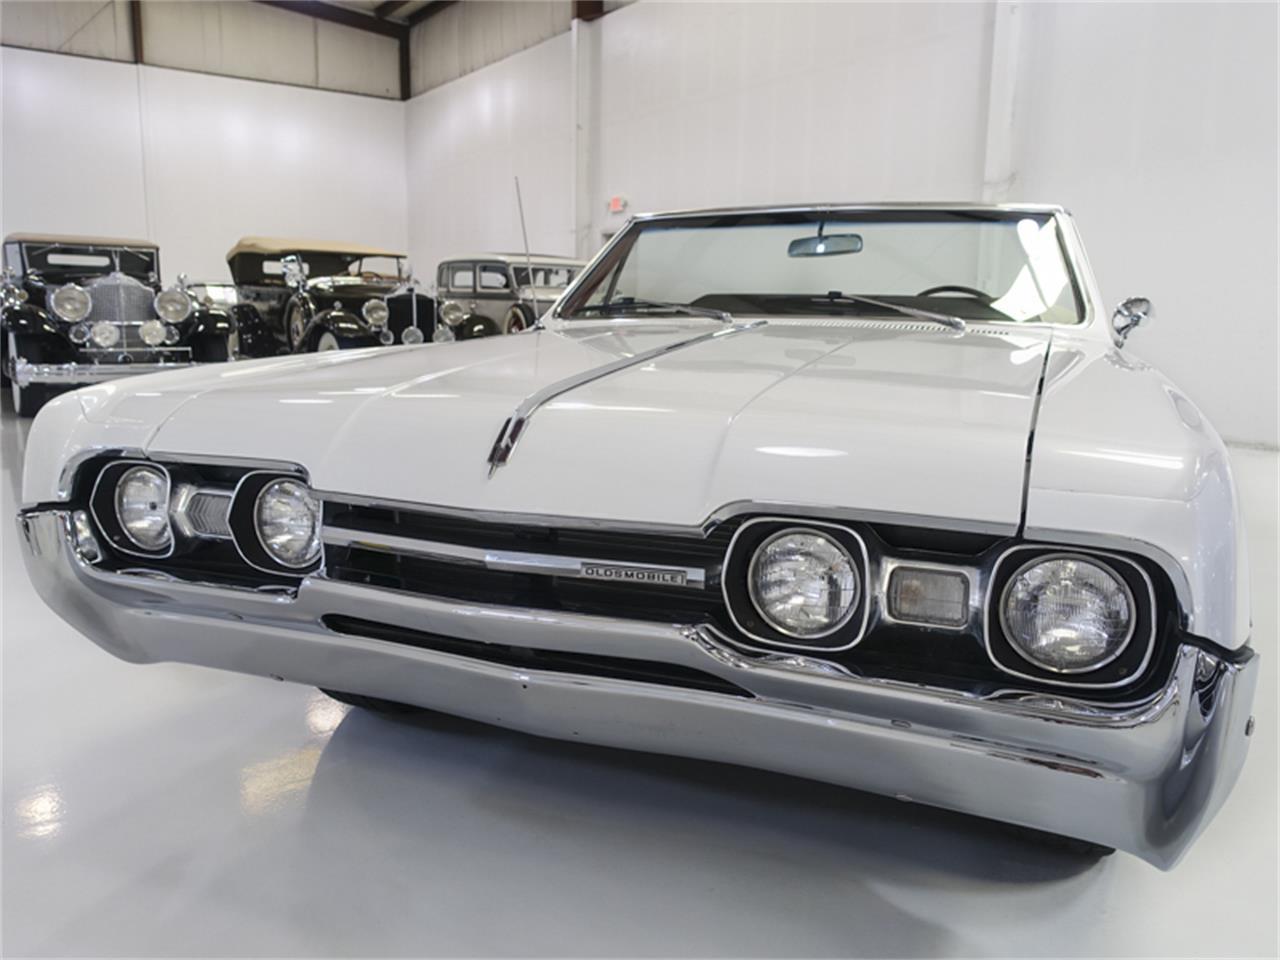 Large Picture of 1967 Cutlass Supreme located in Missouri - $29,900.00 - QK0F